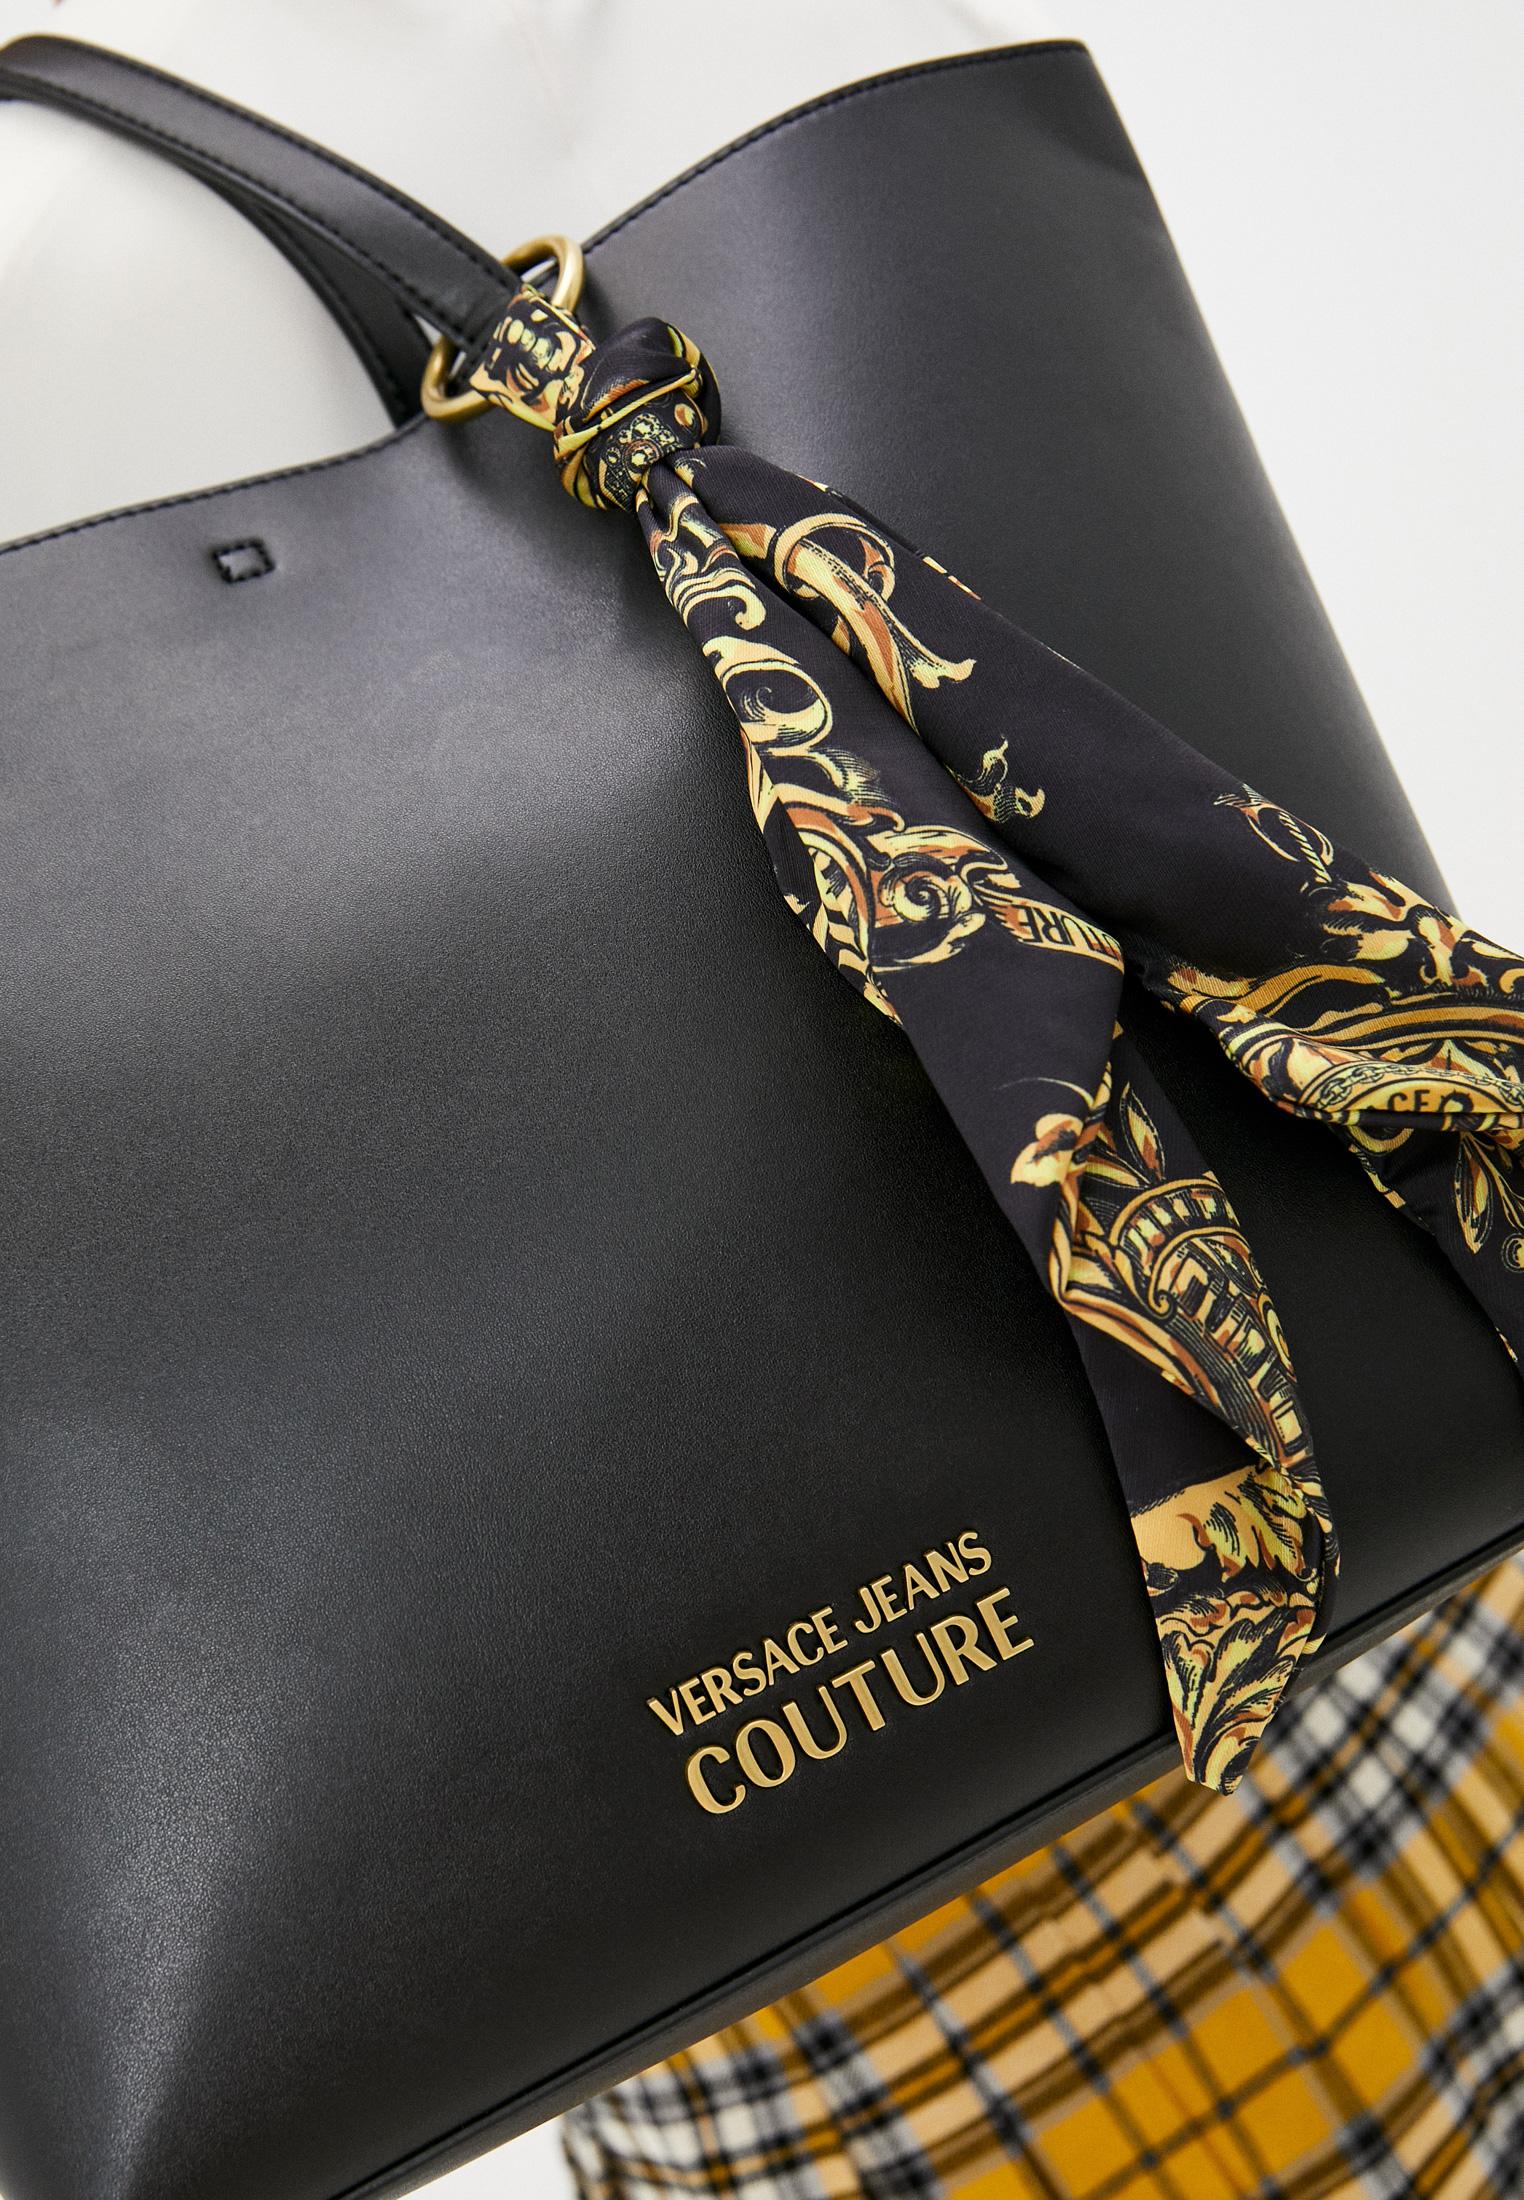 Сумка Versace Jeans Couture Сумка и органайзер Versace Jeans Couture